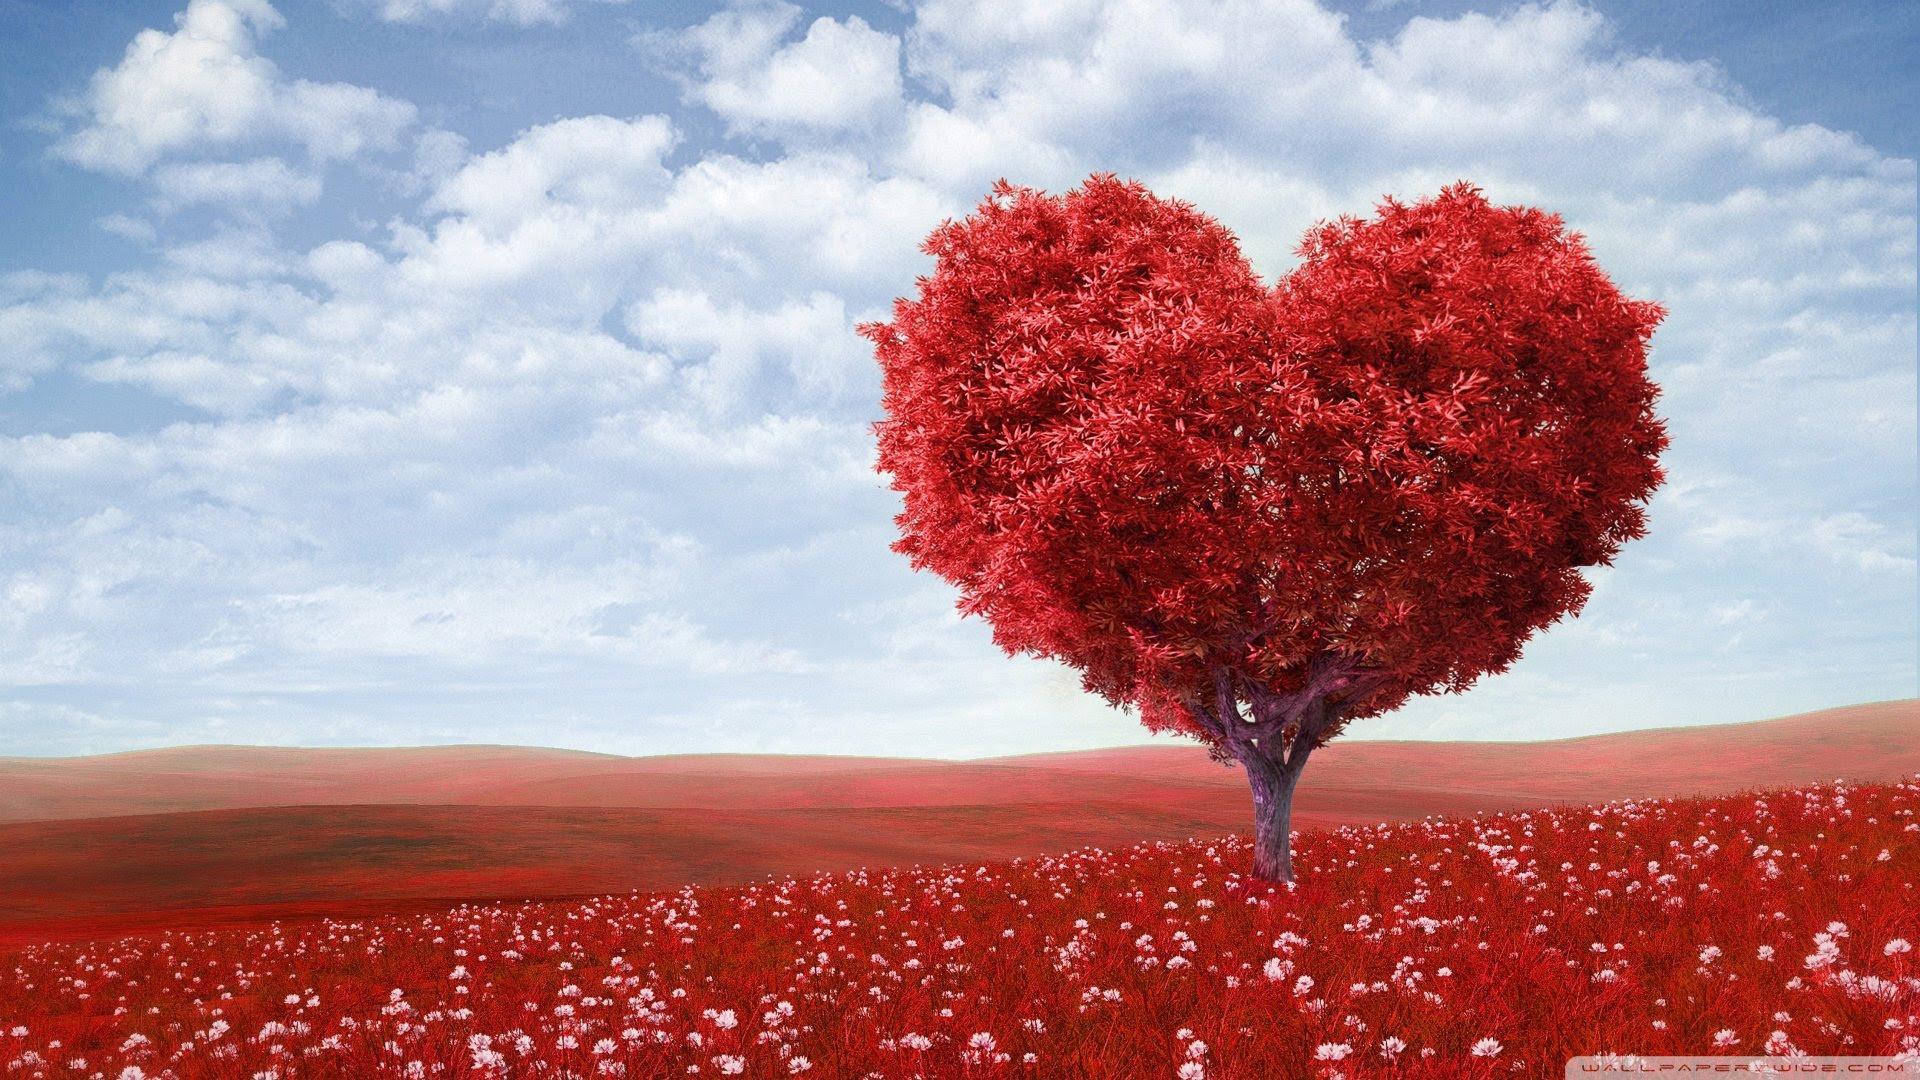 Beautifull of the Love Tree Hd Wallpaper [1920x1080]